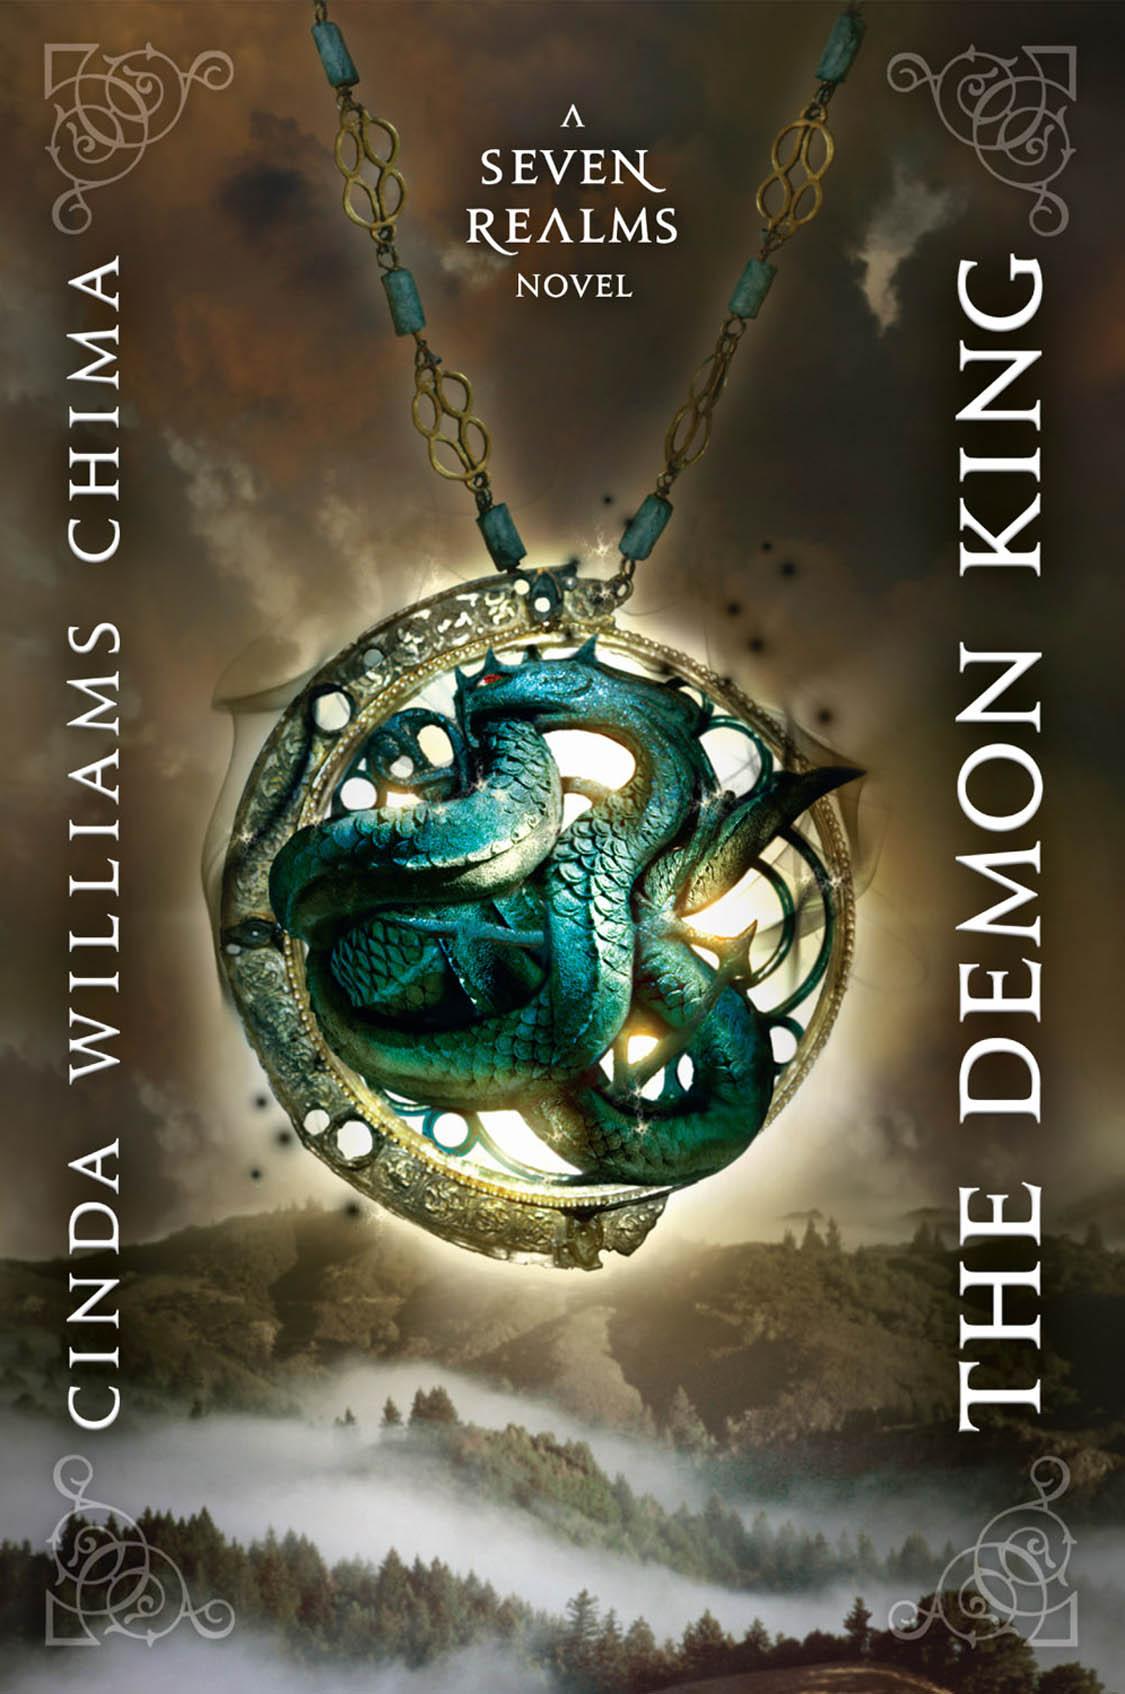 cinda-williams-chima-demon-king.jpg